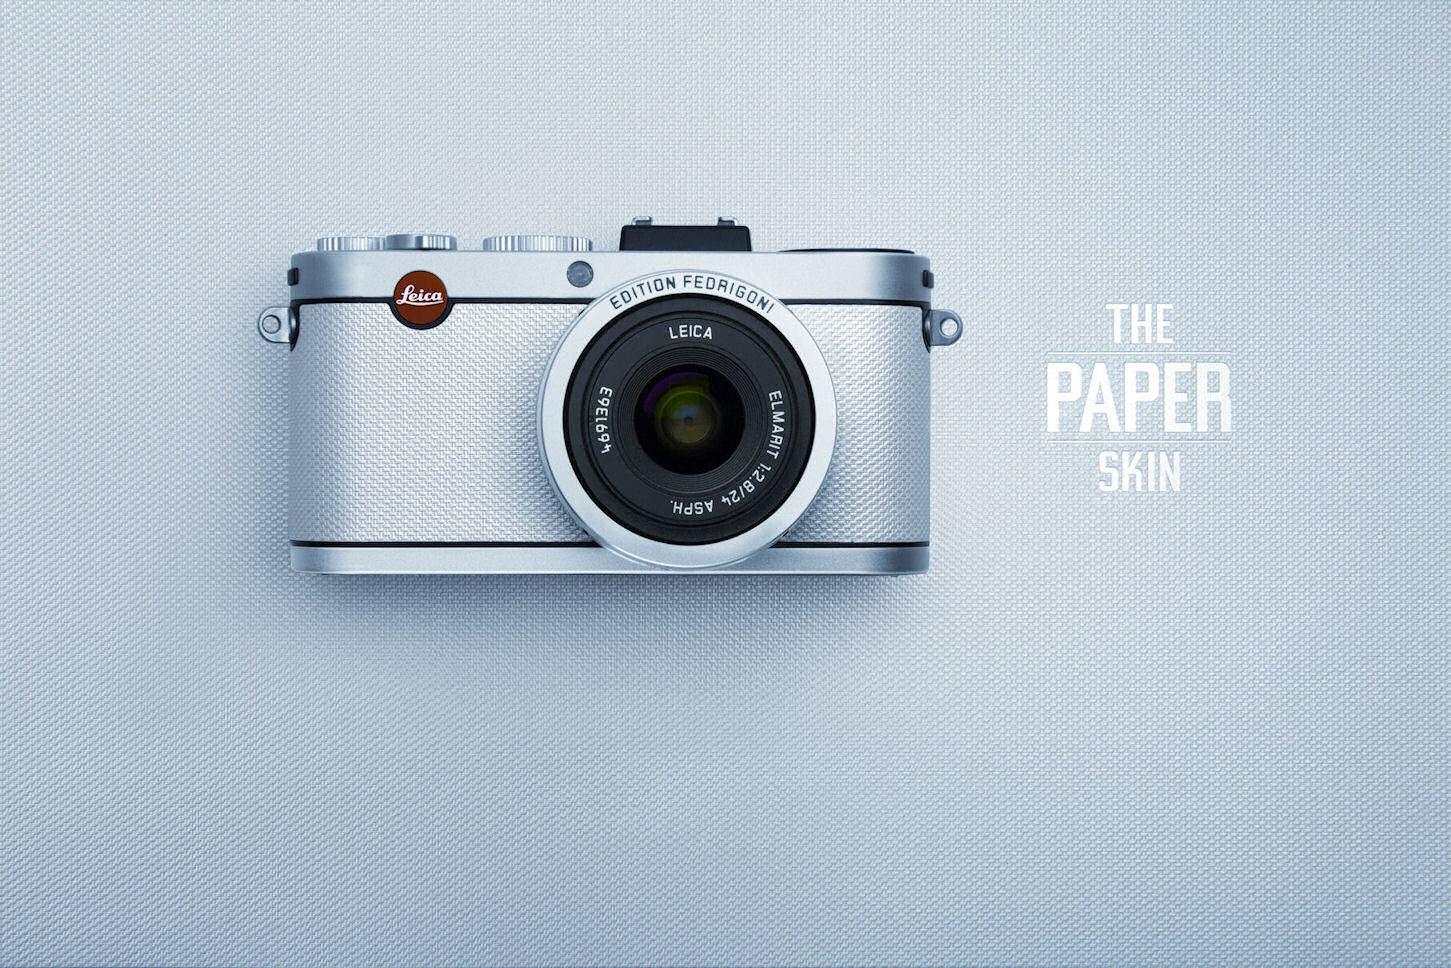 Leica Paper Skin Fedrigoni 10